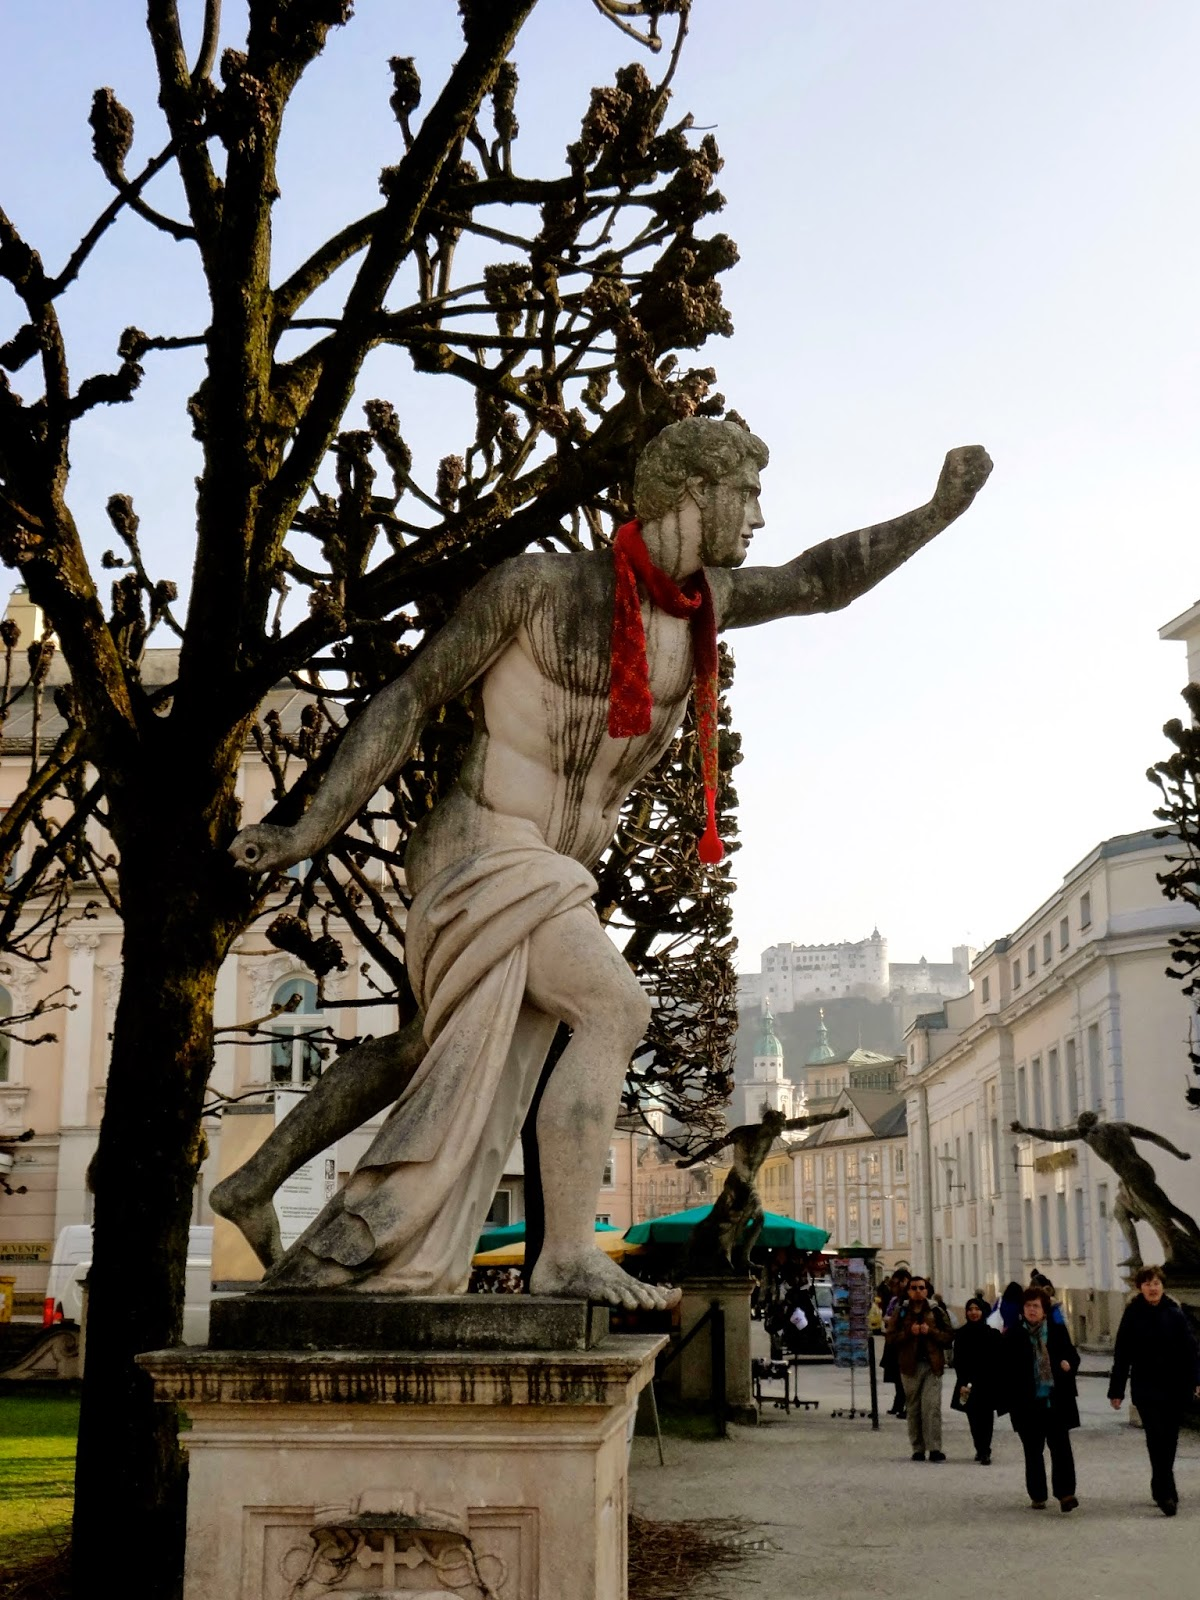 Statue wearing a scarf in Salzburg, Austria